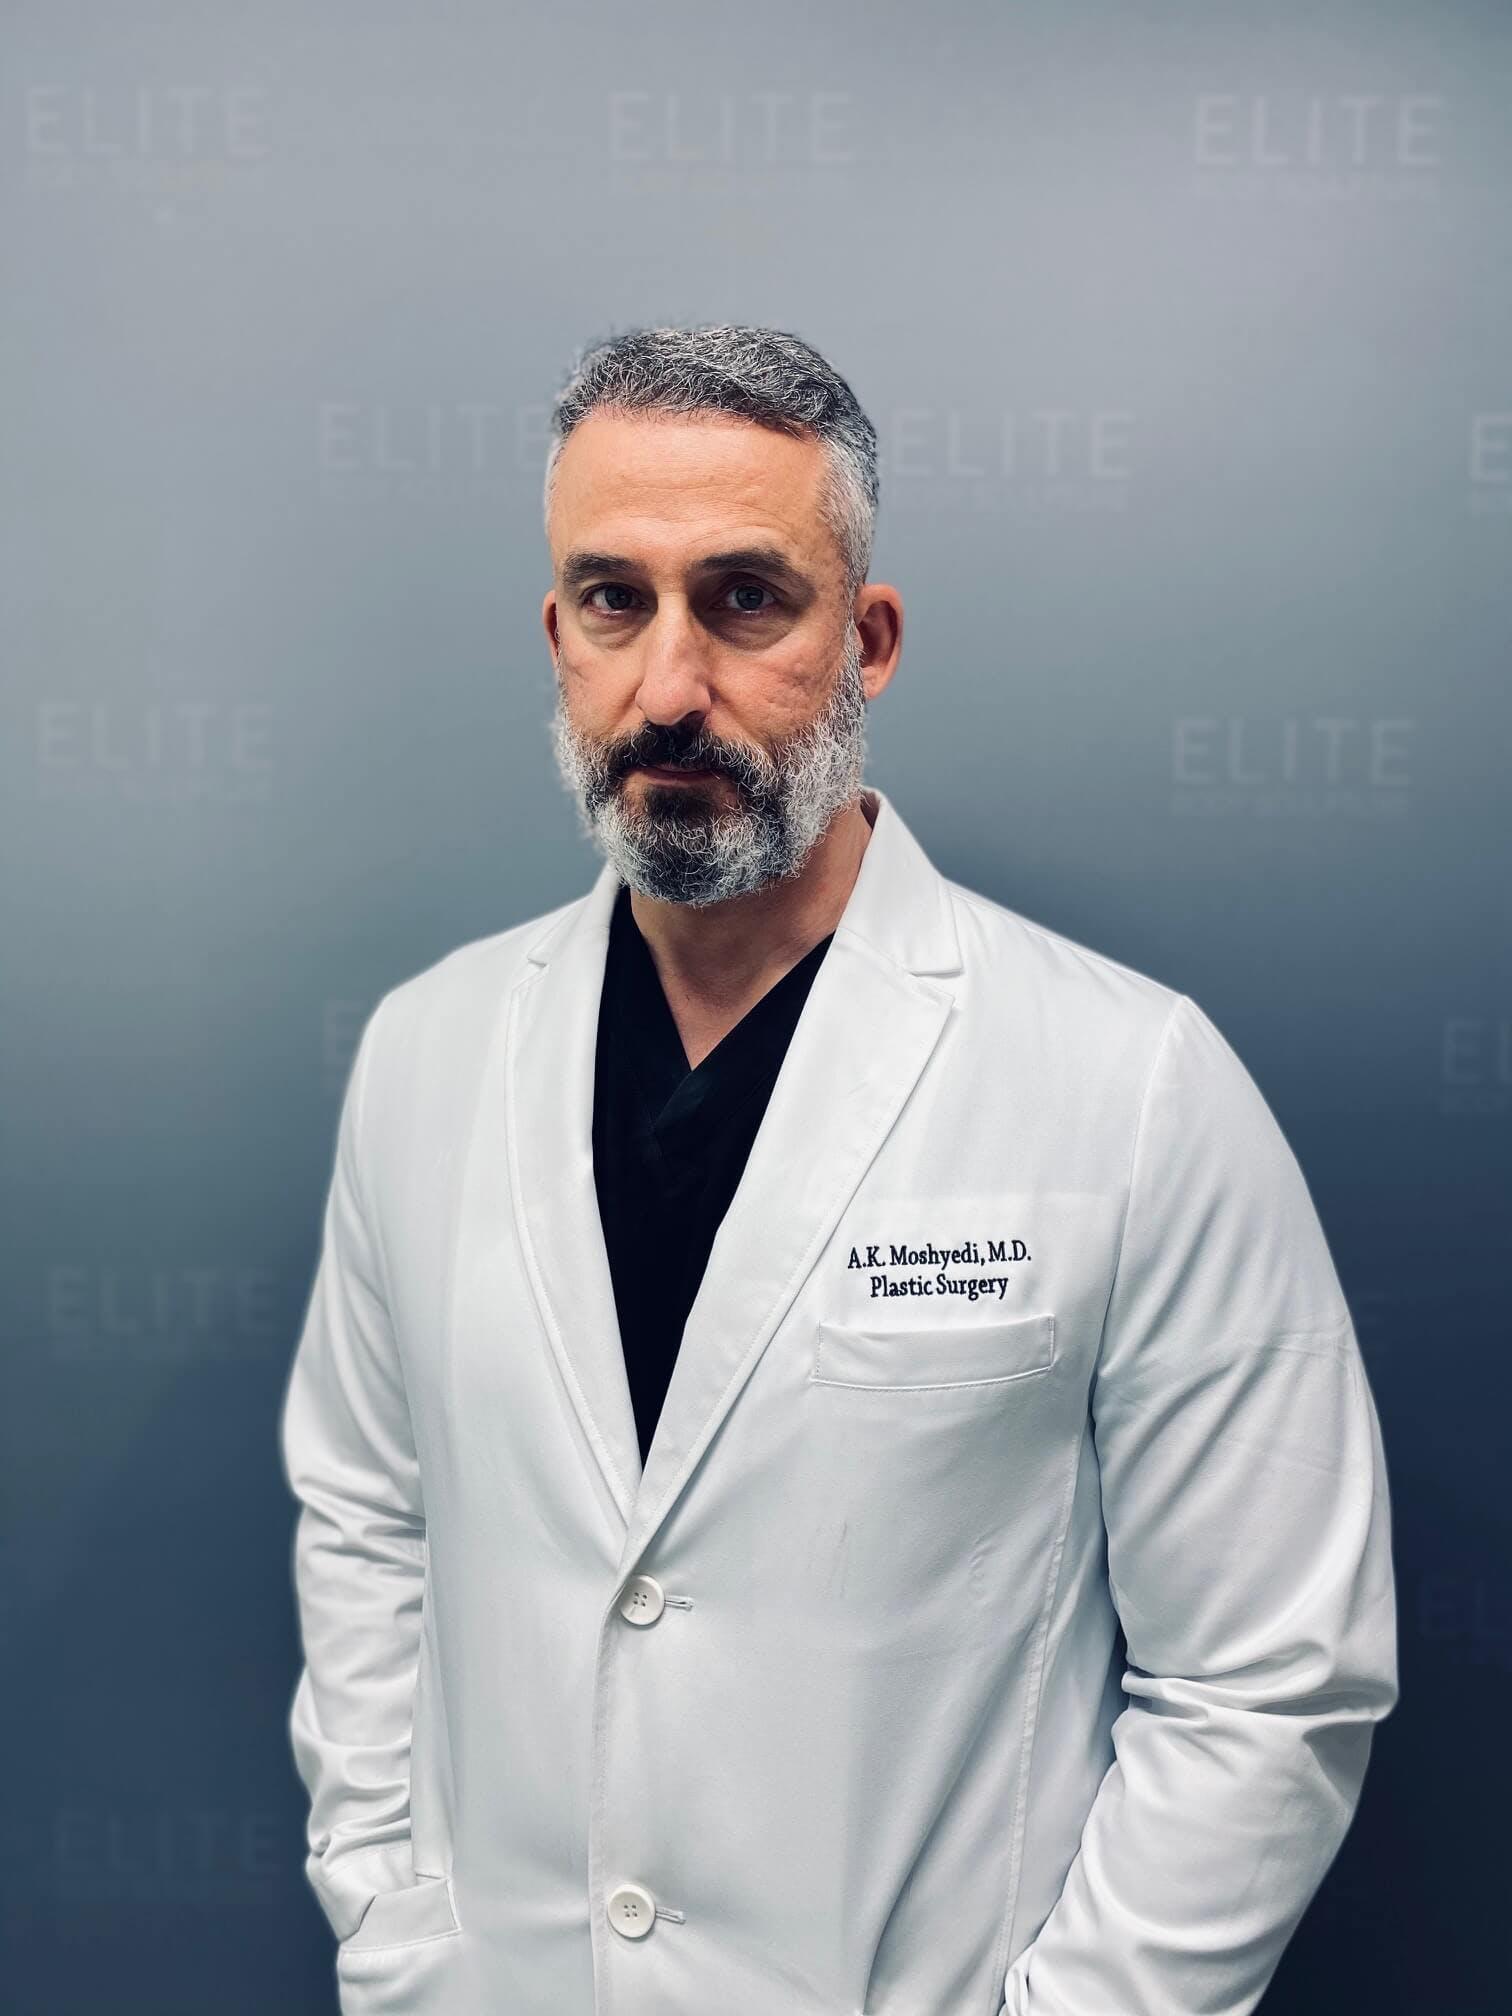 Dr. Armin Karl Moshyedi